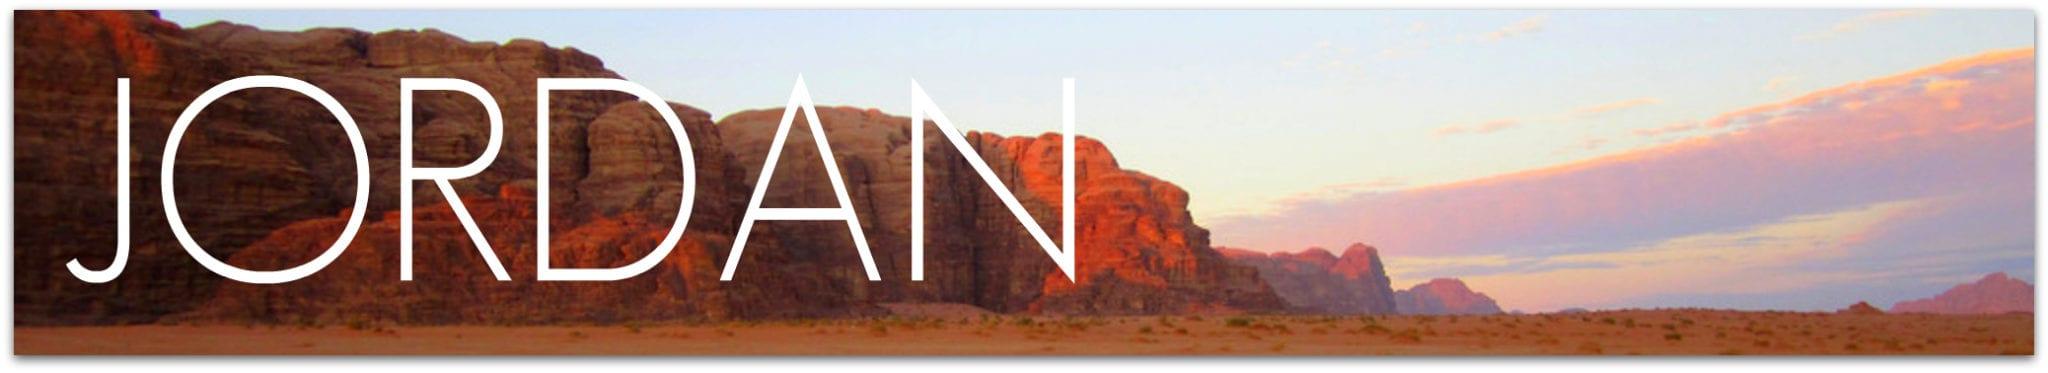 destination-jordan